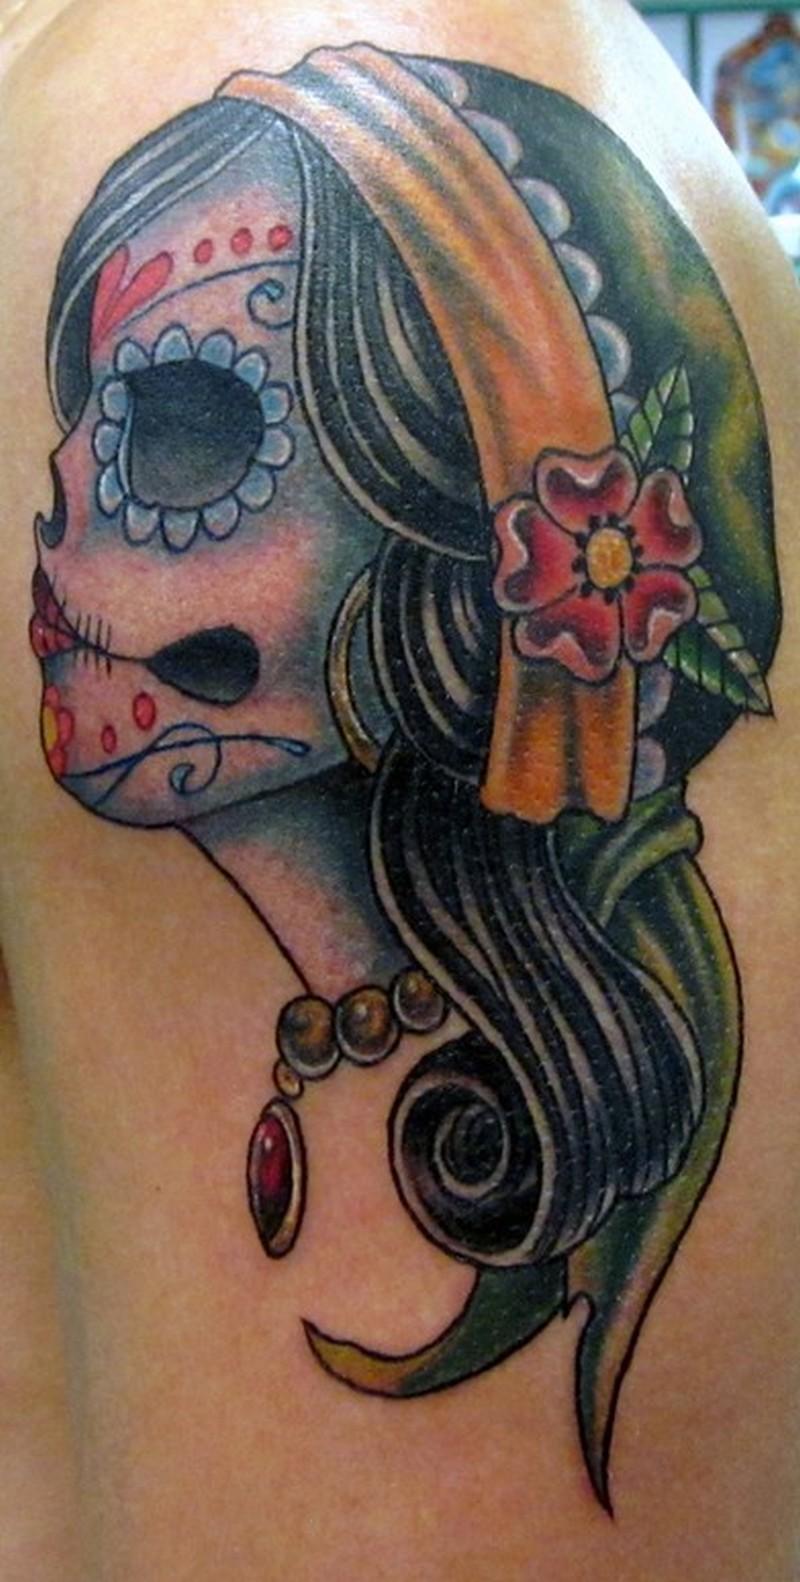 Sugar skull gypsy tattoo design 3 - Tattoos Book - 65.000 Tattoos ...